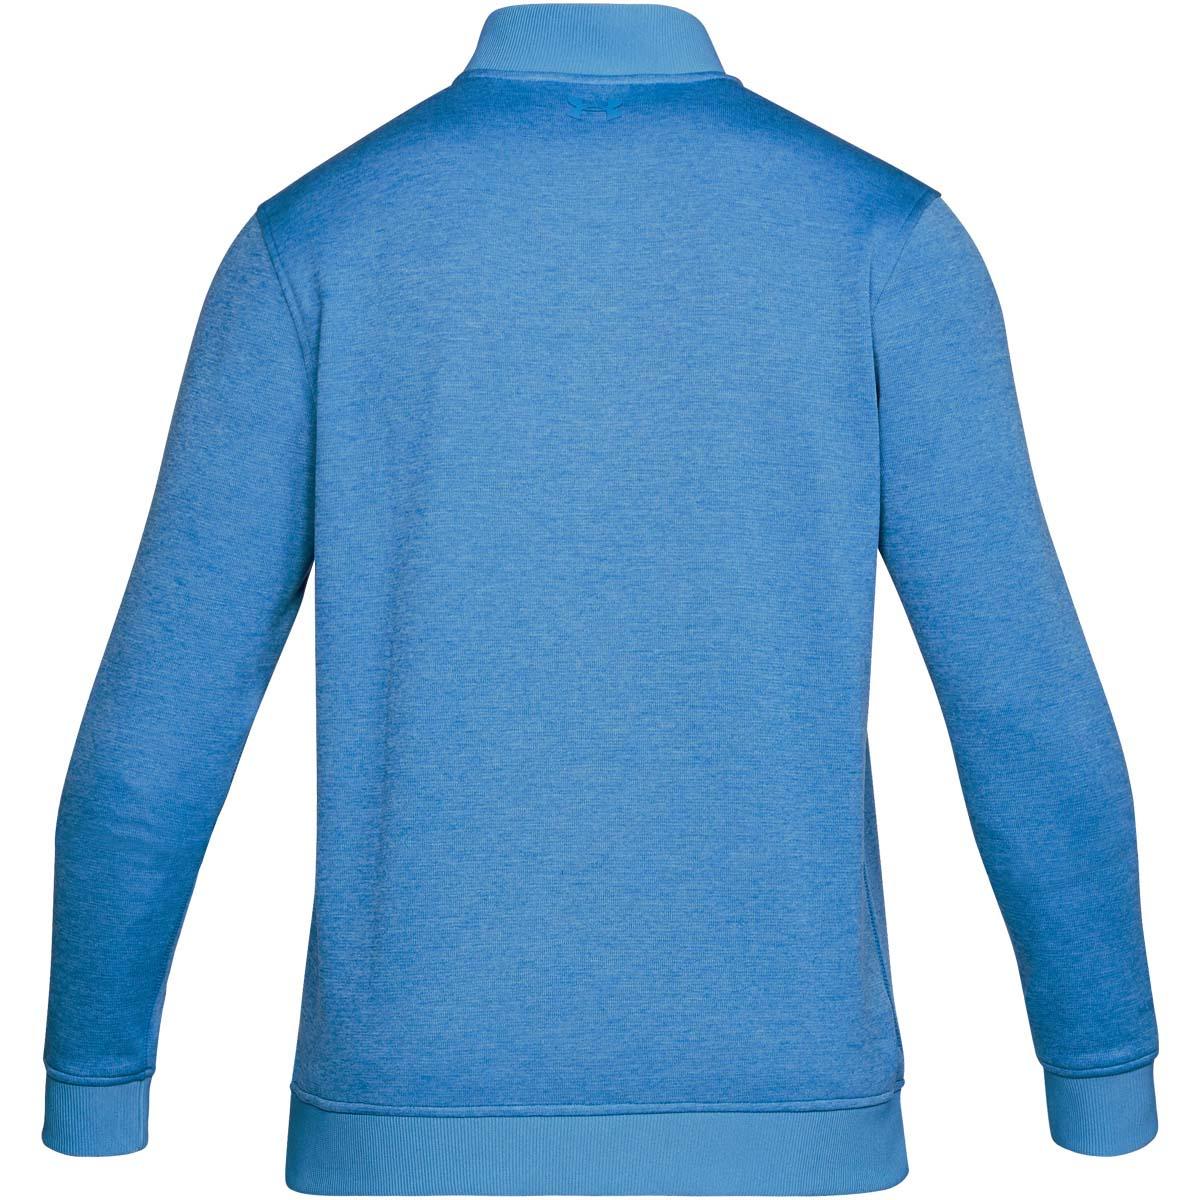 Under-Armour-Mens-UA-Storm-Sweater-Fleece-1-4-Zip-Pullover-Jumper-25-OFF-RRP thumbnail 20